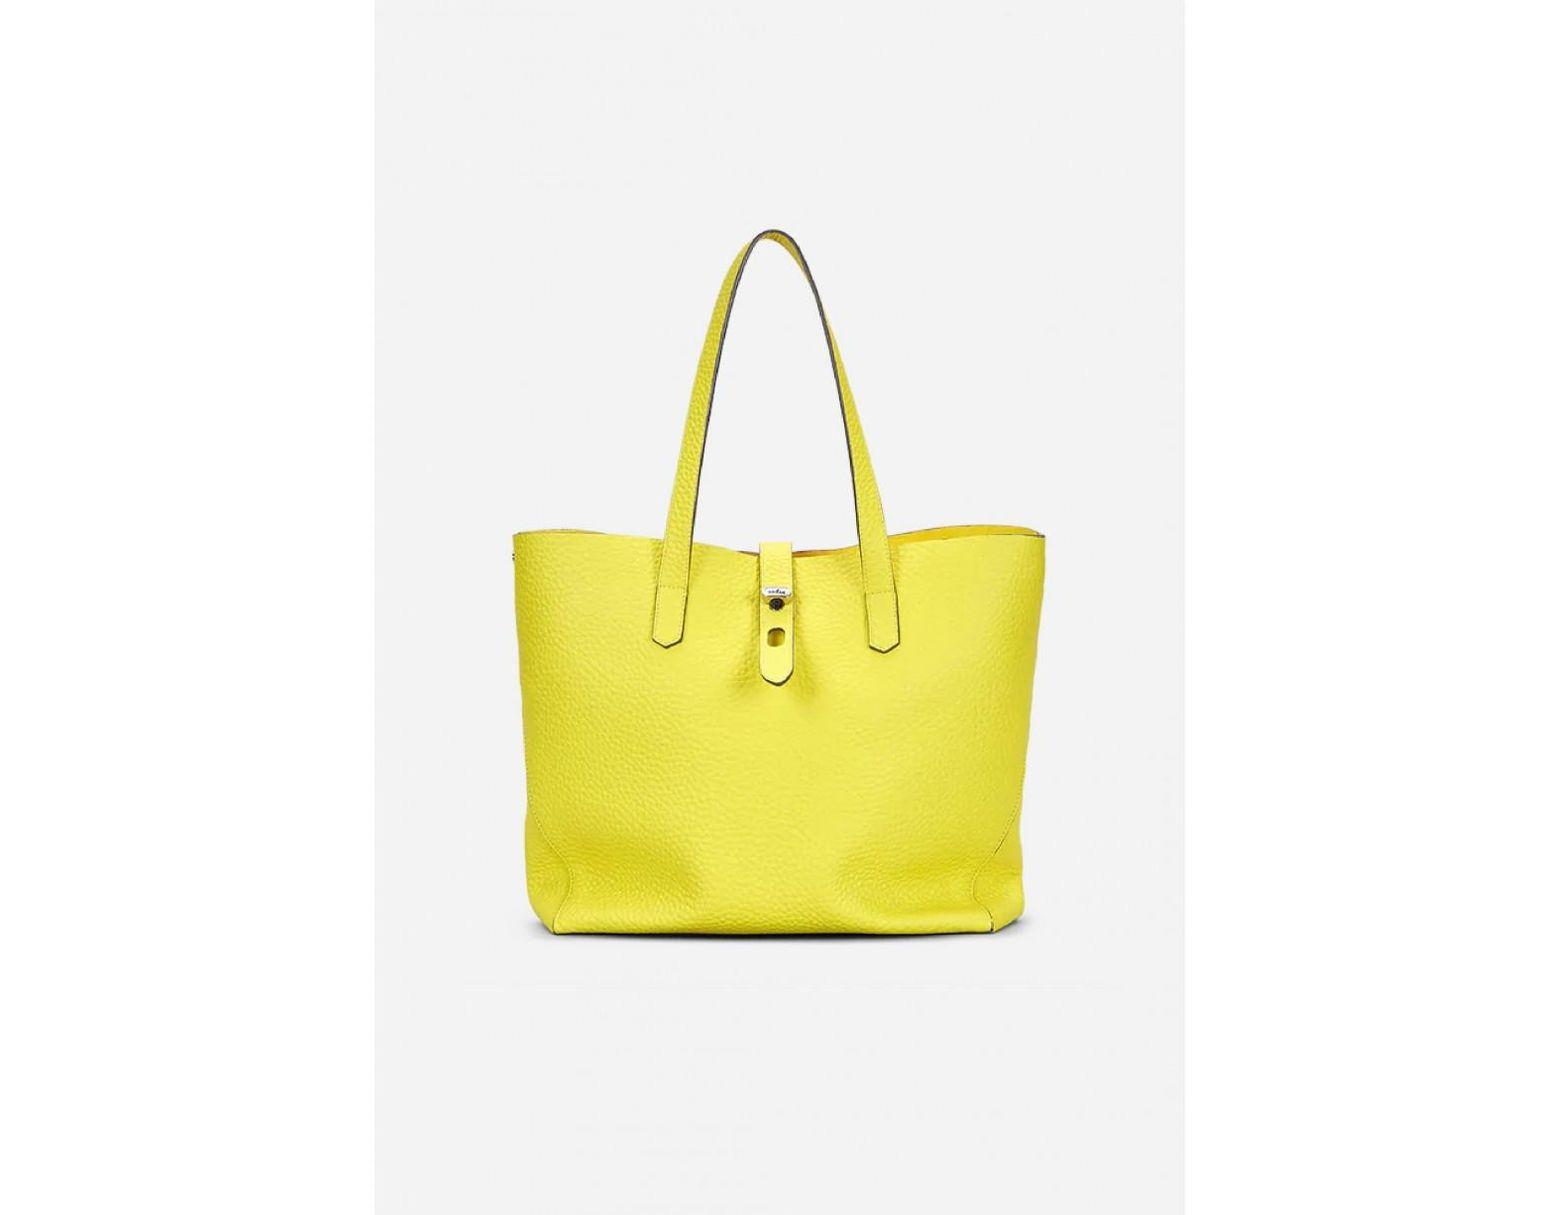 d33fe5c193c Hogan Shopping Bag Yellow in Yellow - Lyst